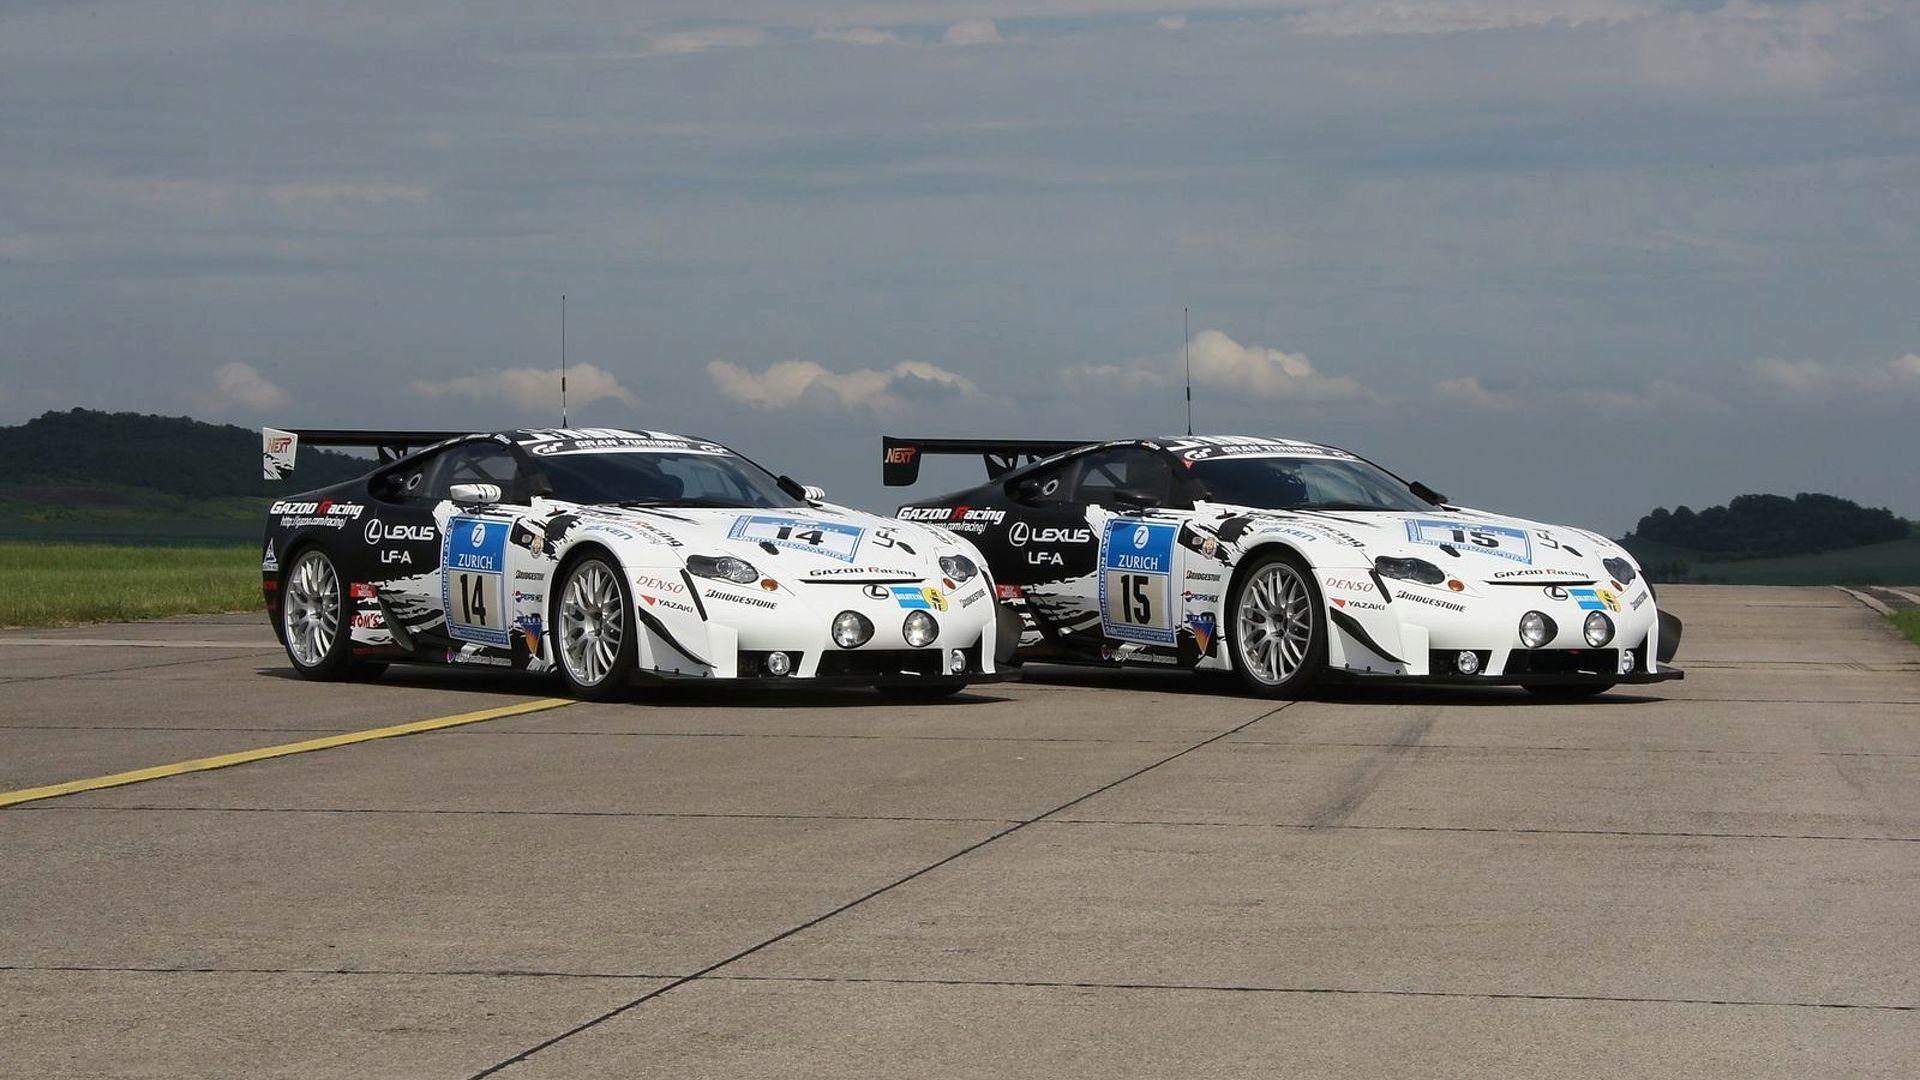 Lexus Releases LF-A Race Car Images Ahead of 24-hour Nürburgring Race